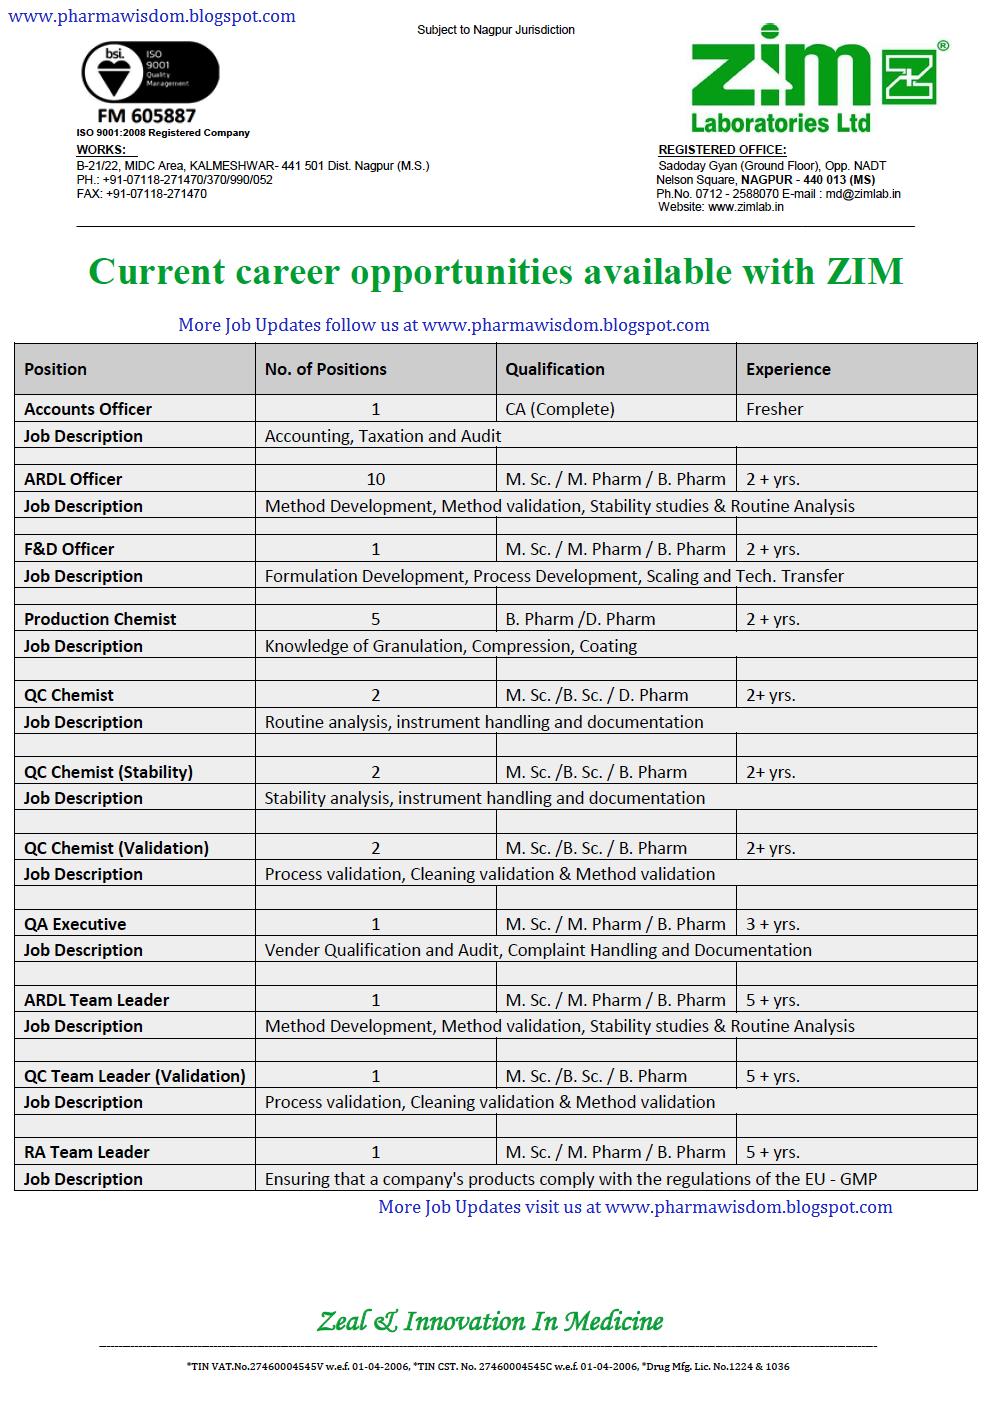 Quality Control QC Chemist Resume CV IndianJobTalks 7171974 ...